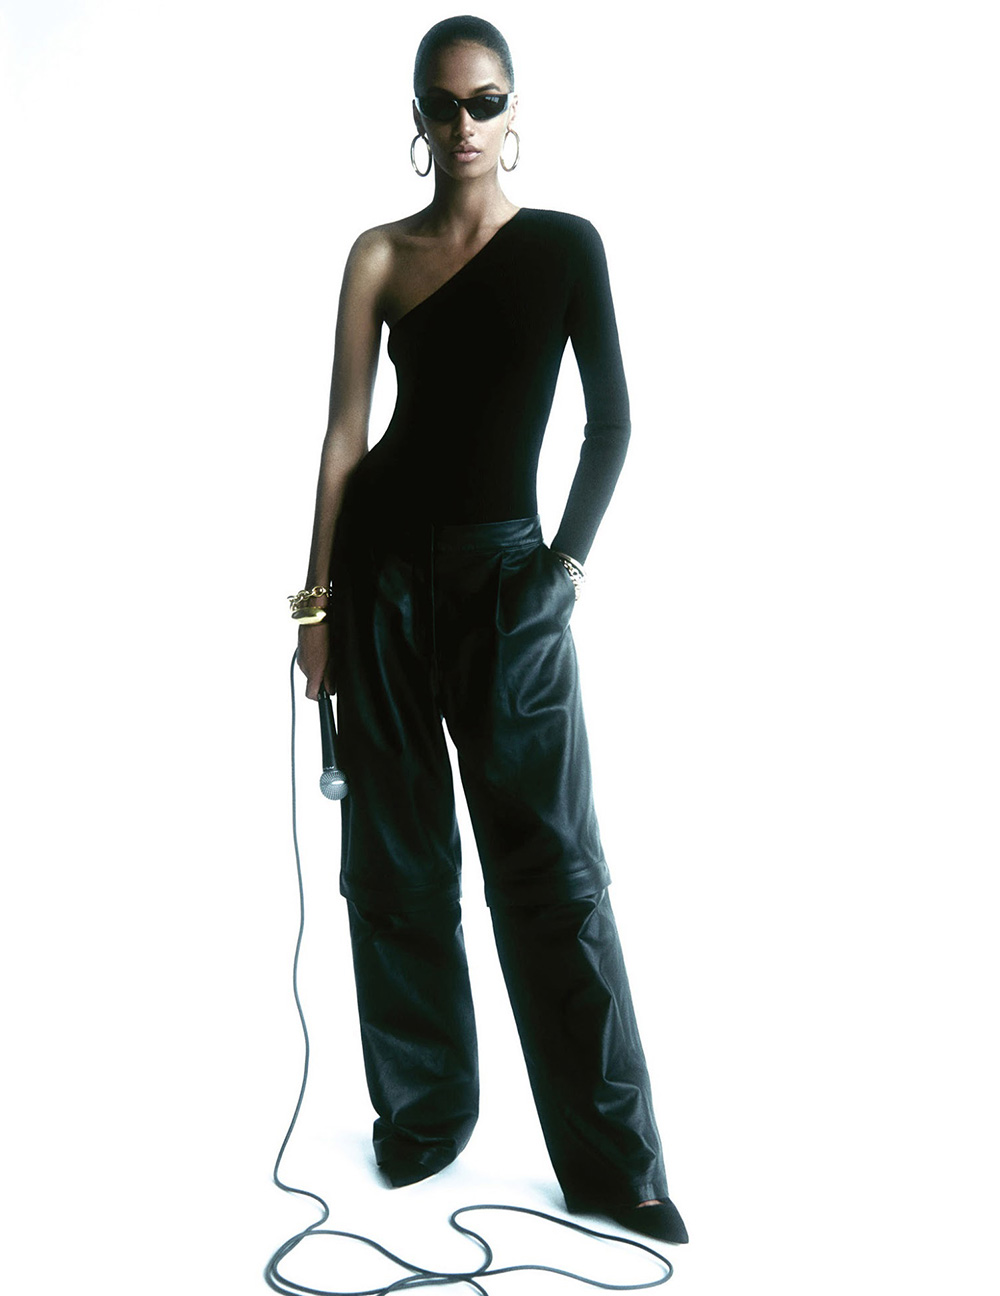 Sacha Quenby by Robin Galiegue for Vogue Paris November 2020